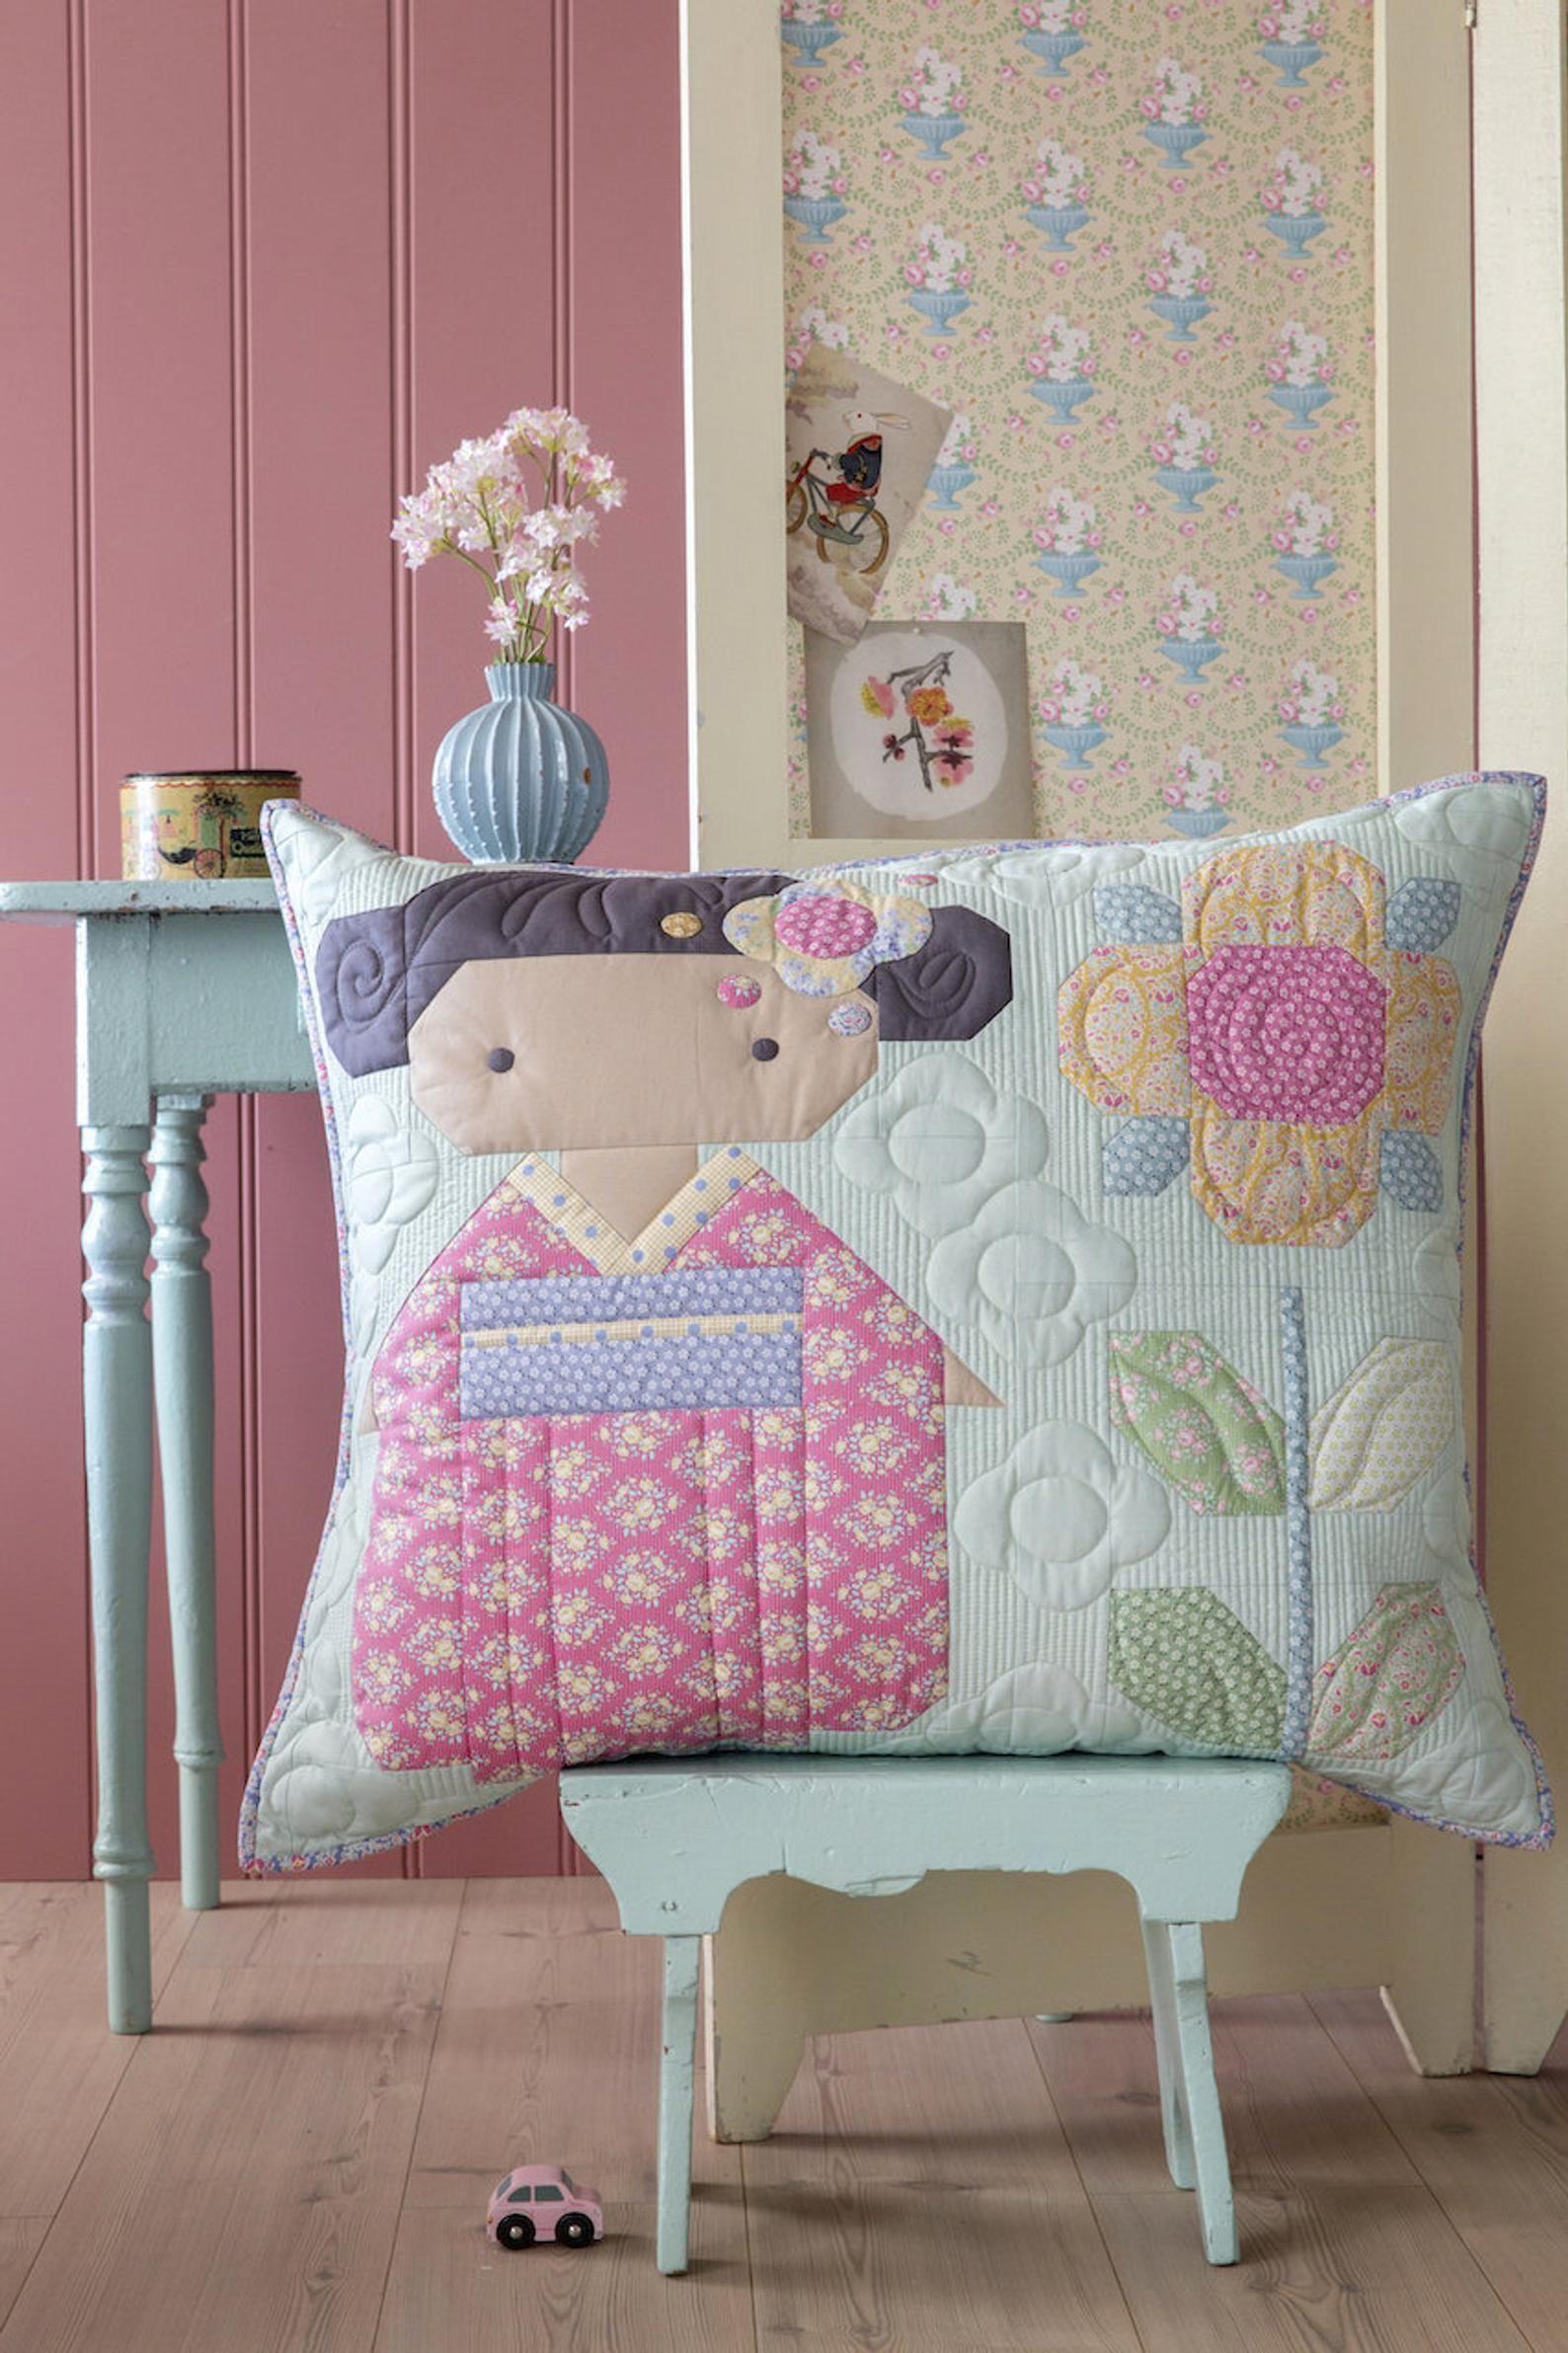 TILDA KIMONO GIRLS Pillow in Soft Teal Kit Tilda Happy   Etsy ...